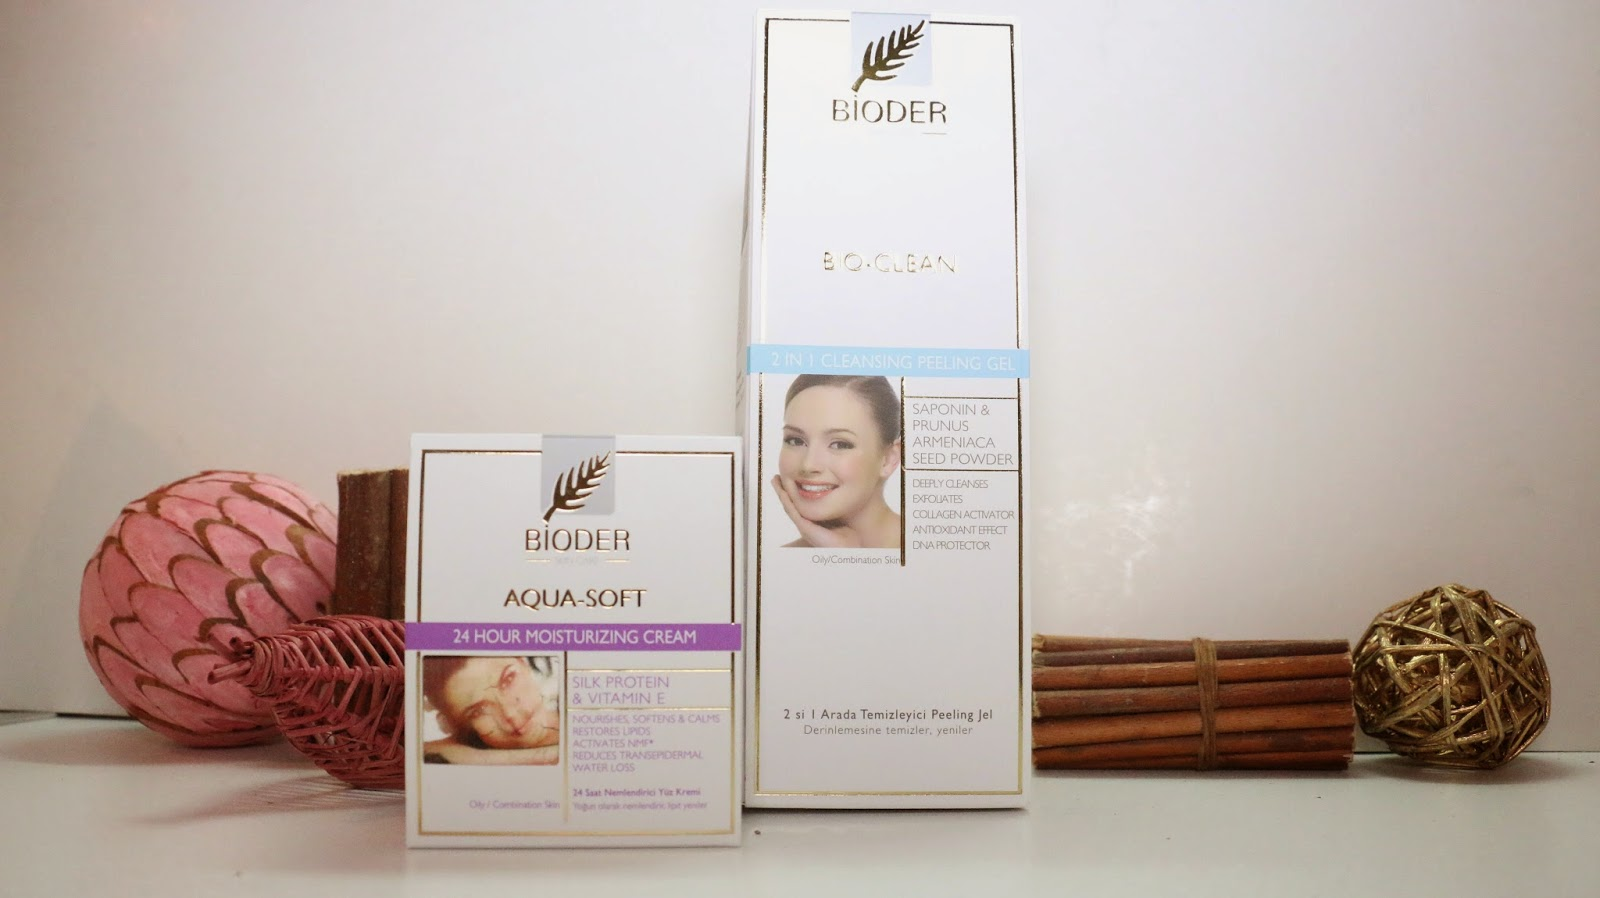 BİOTA - restorex - bioblas - nutraxin - biolady - biobaby - bioder - makyaj blogları - kozmetik blogları - sebnems blog  - saç uzatma